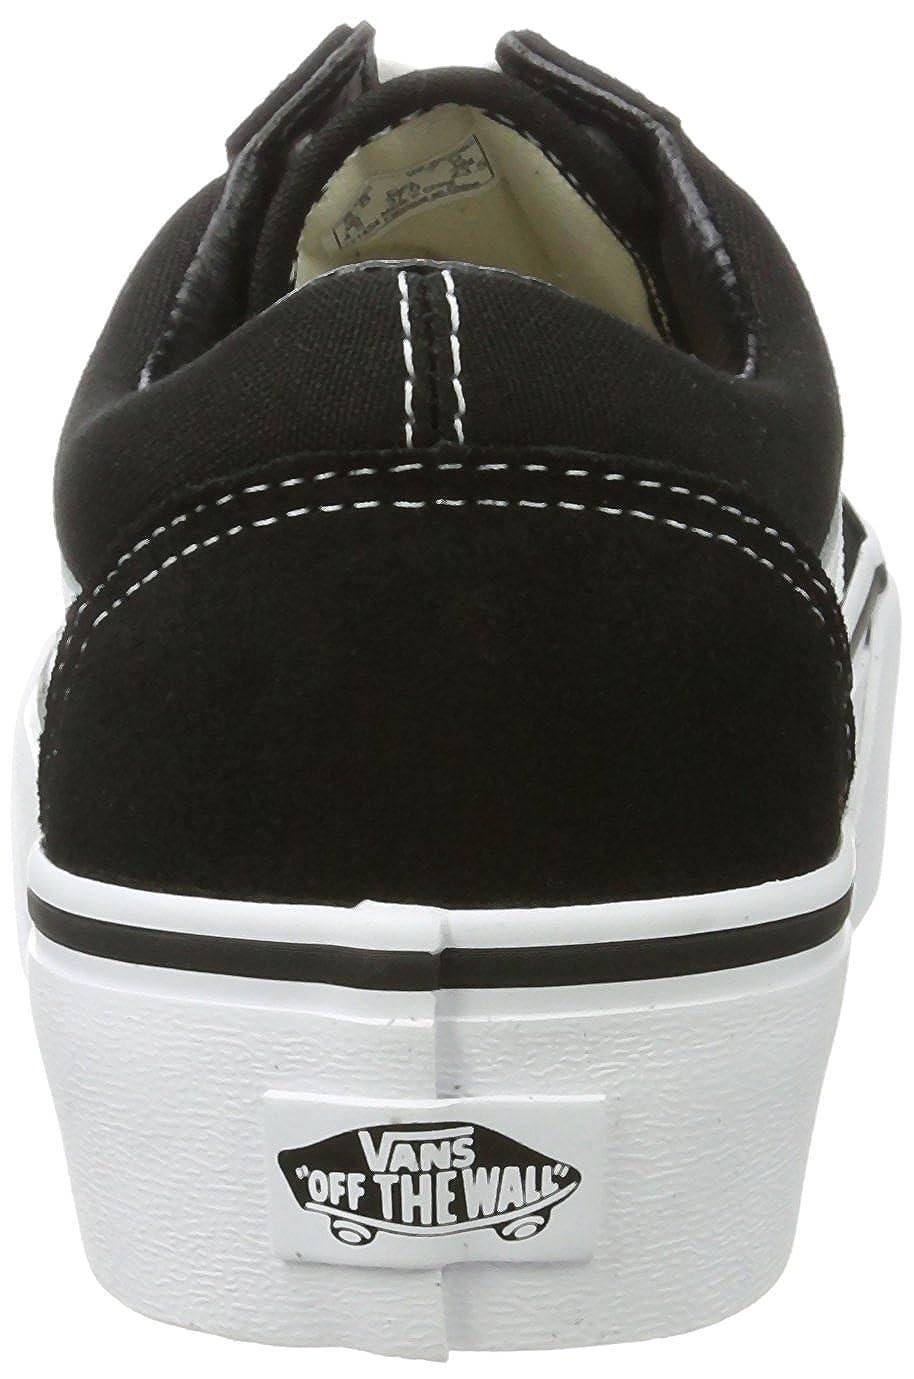 Vans U Old Skool, scarpe scarpe scarpe da ginnastica unisex adulto | Acquista  53d7c4